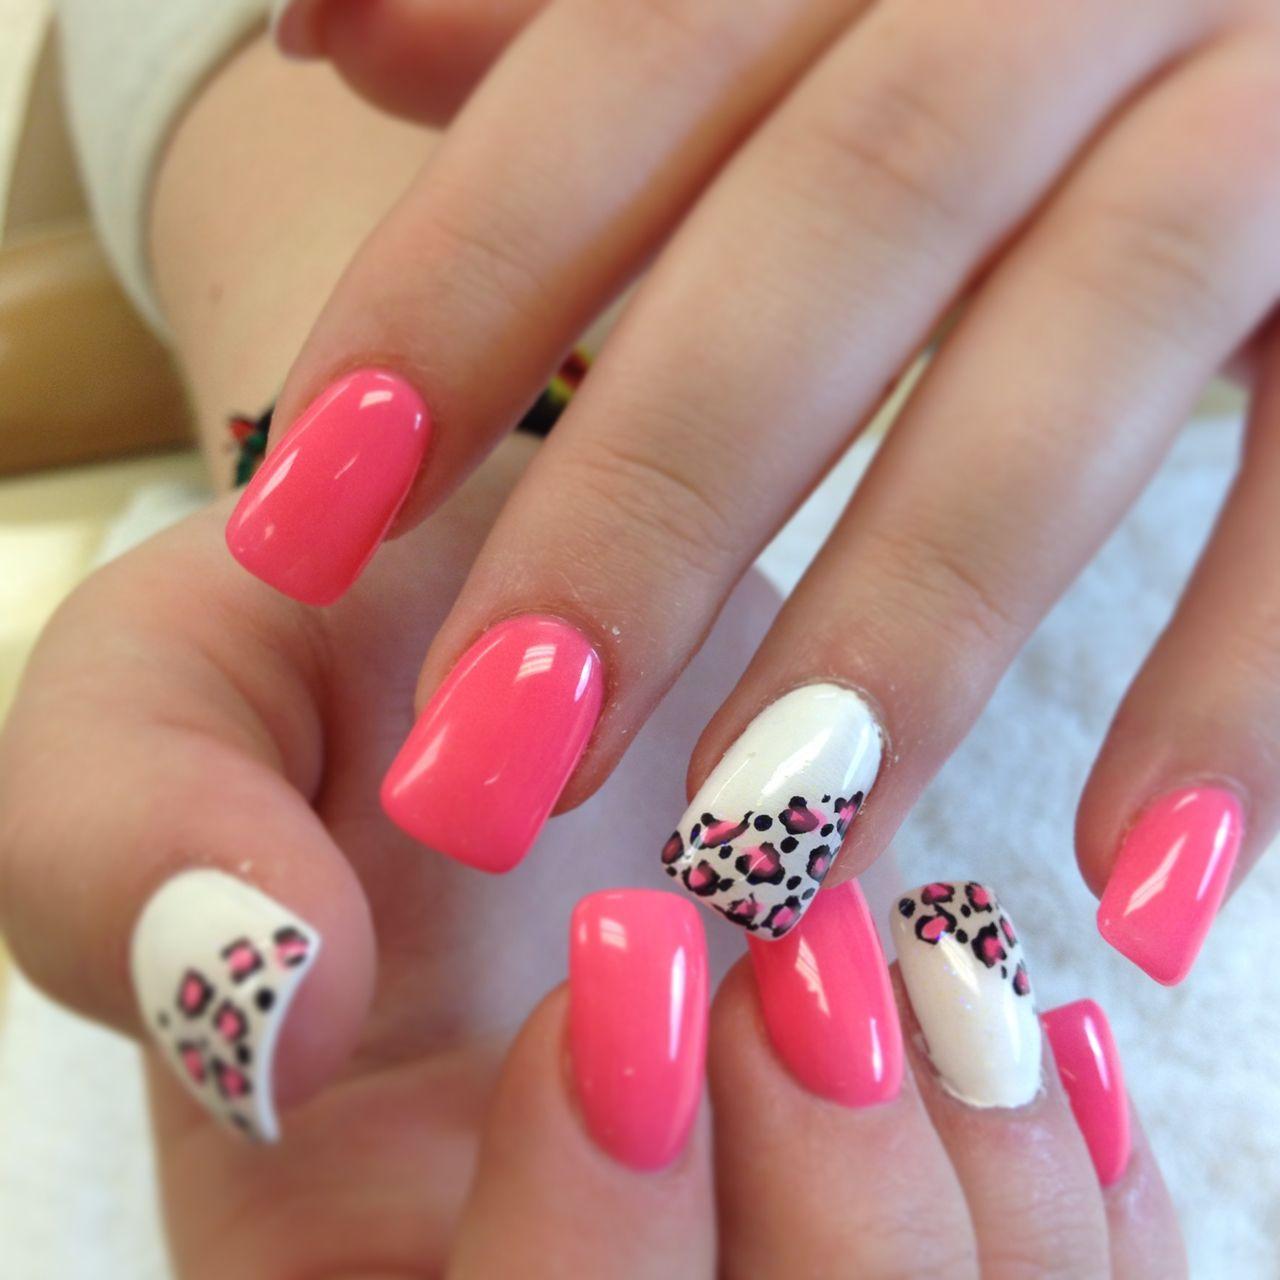 cute nails designs | Cute French Nail Art Design for Girl 2013 ...